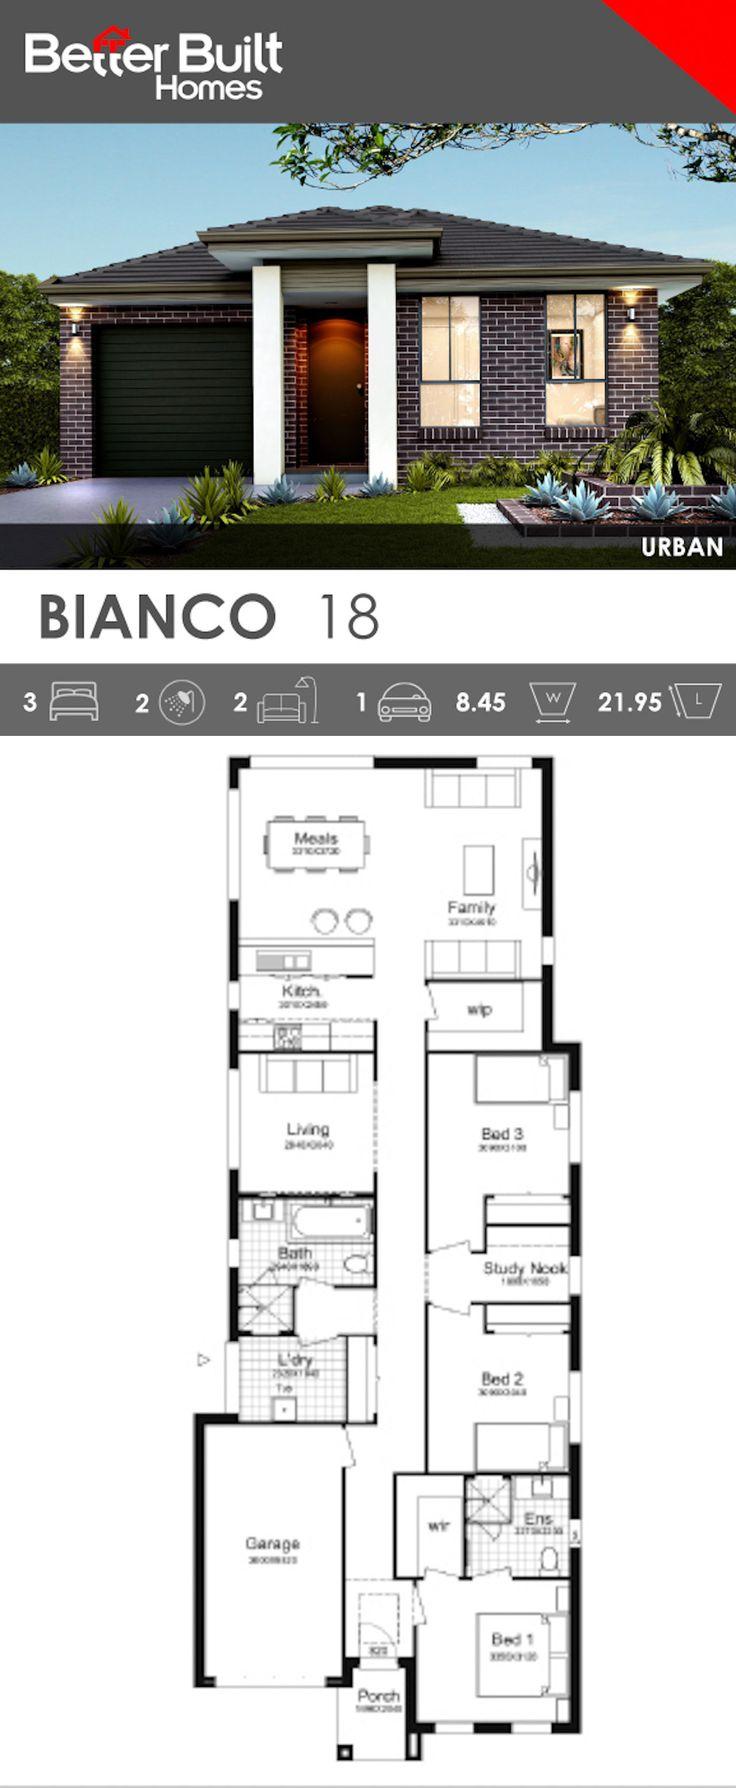 Single Storey House Design, The Bianco 18